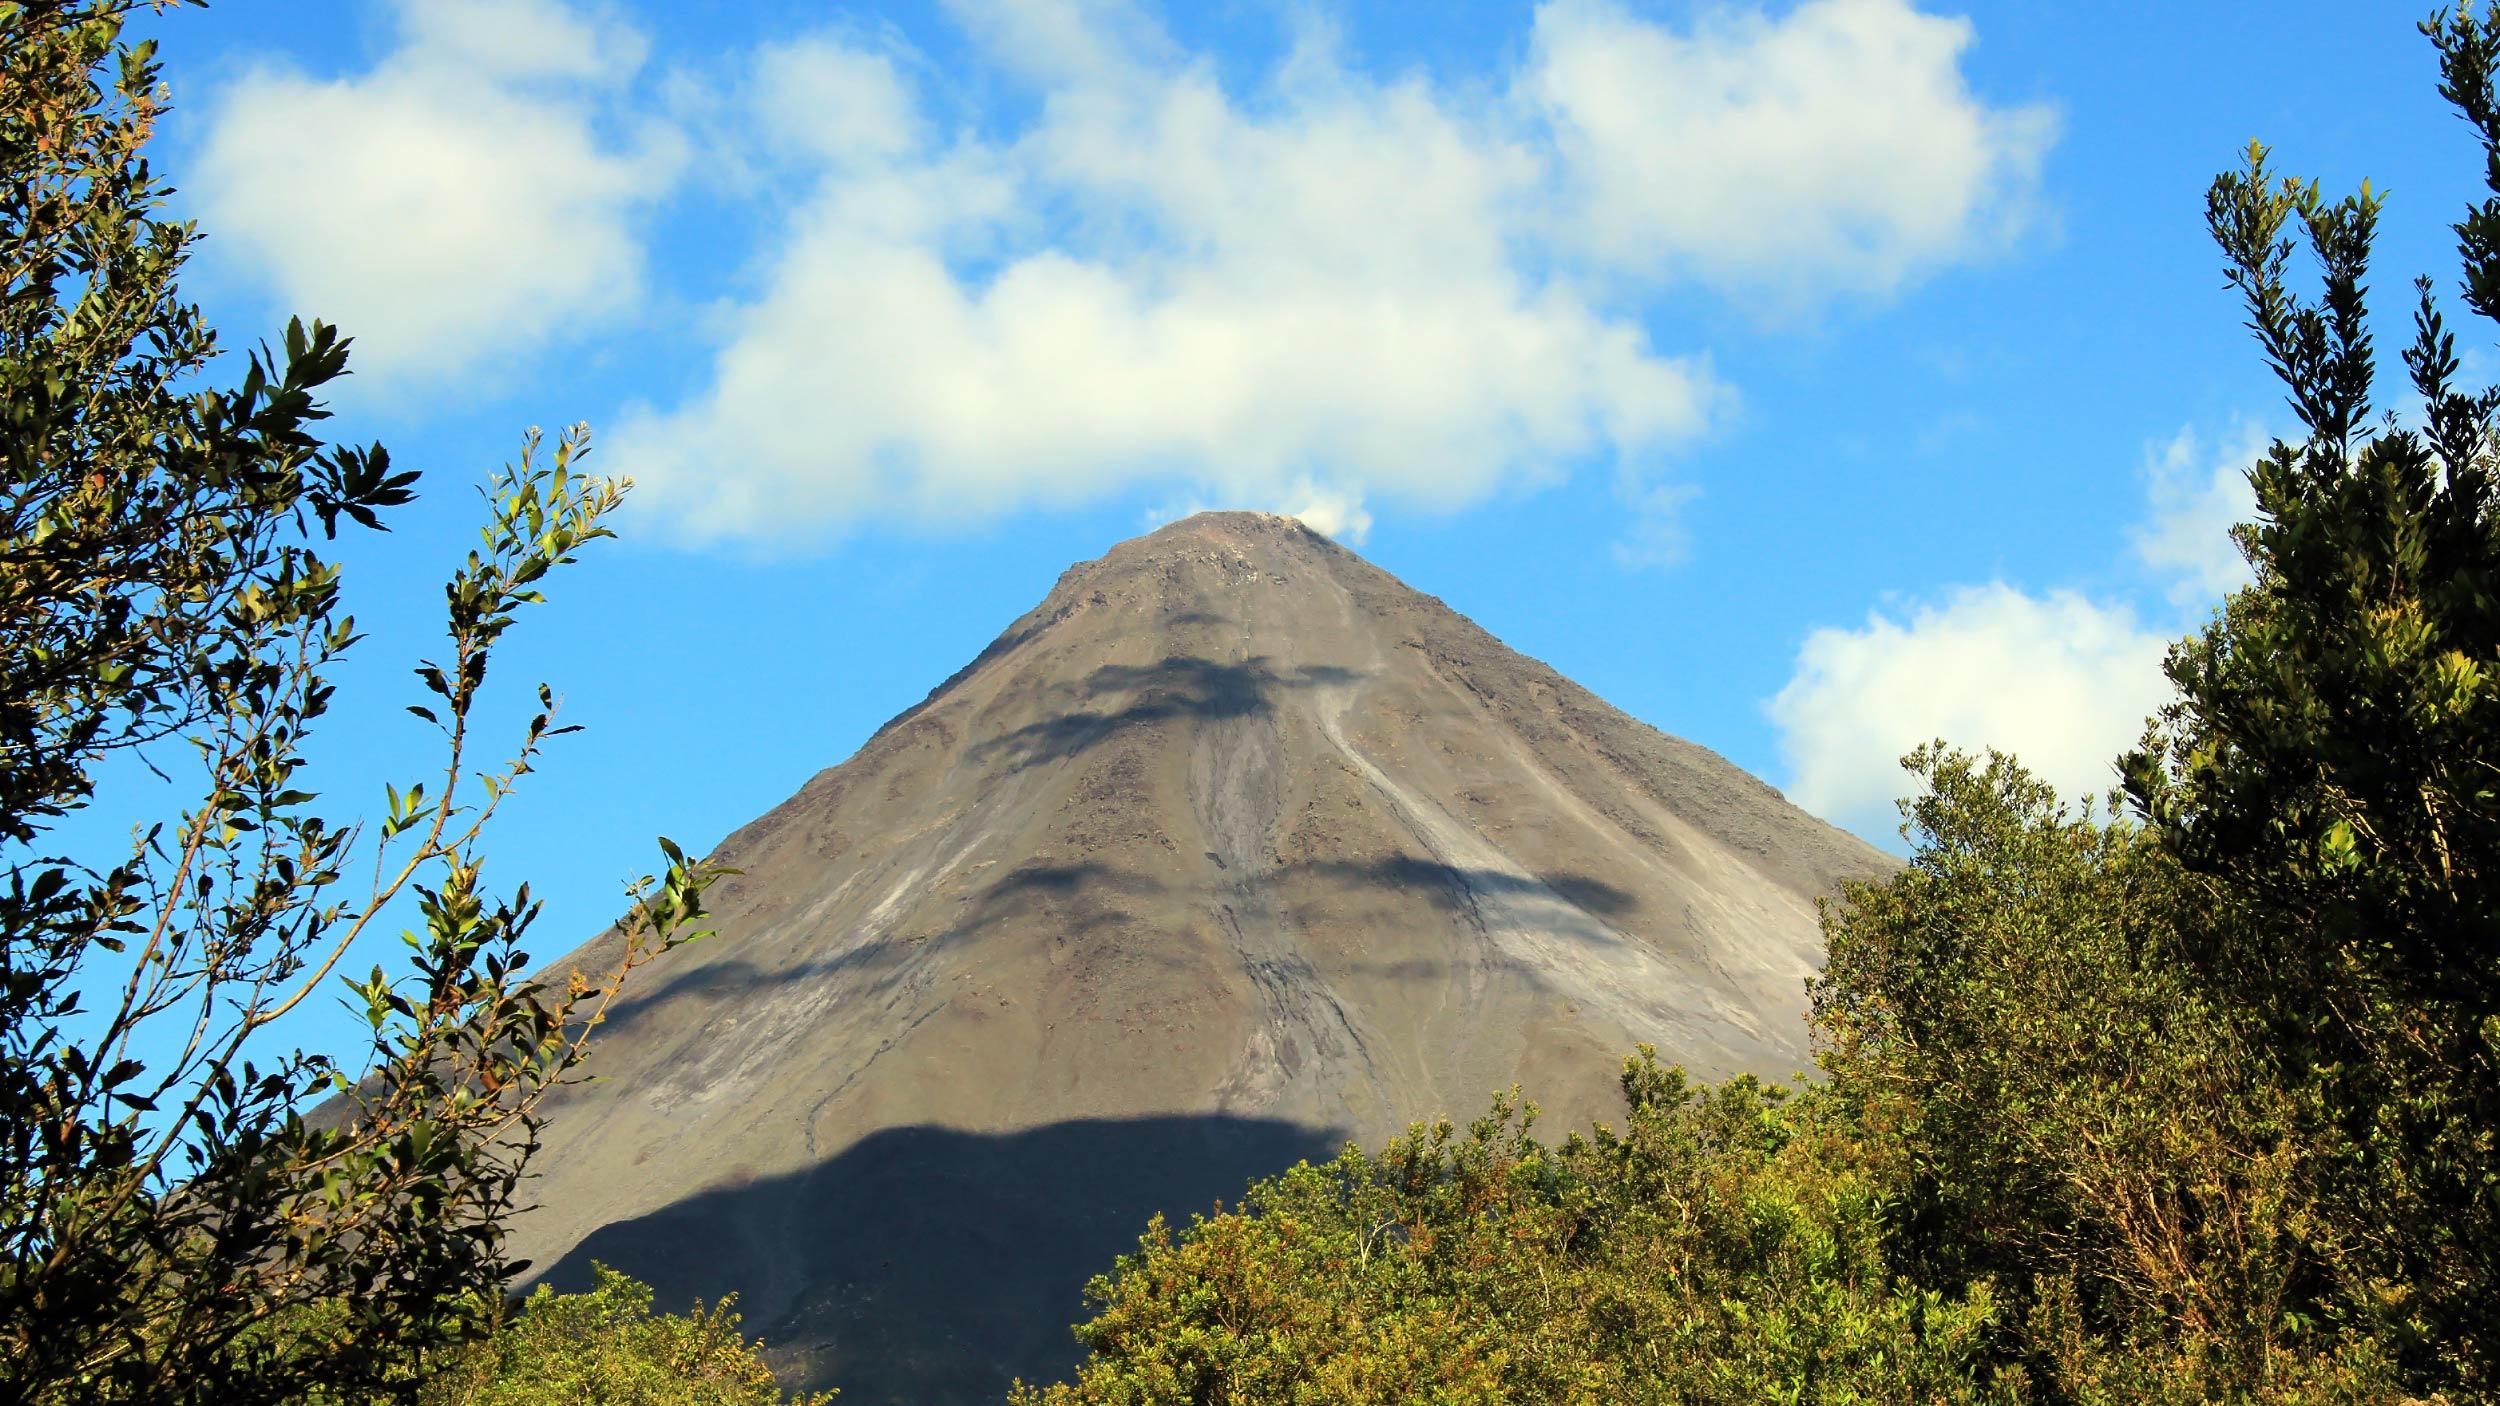 viaje al Volcán Arenal